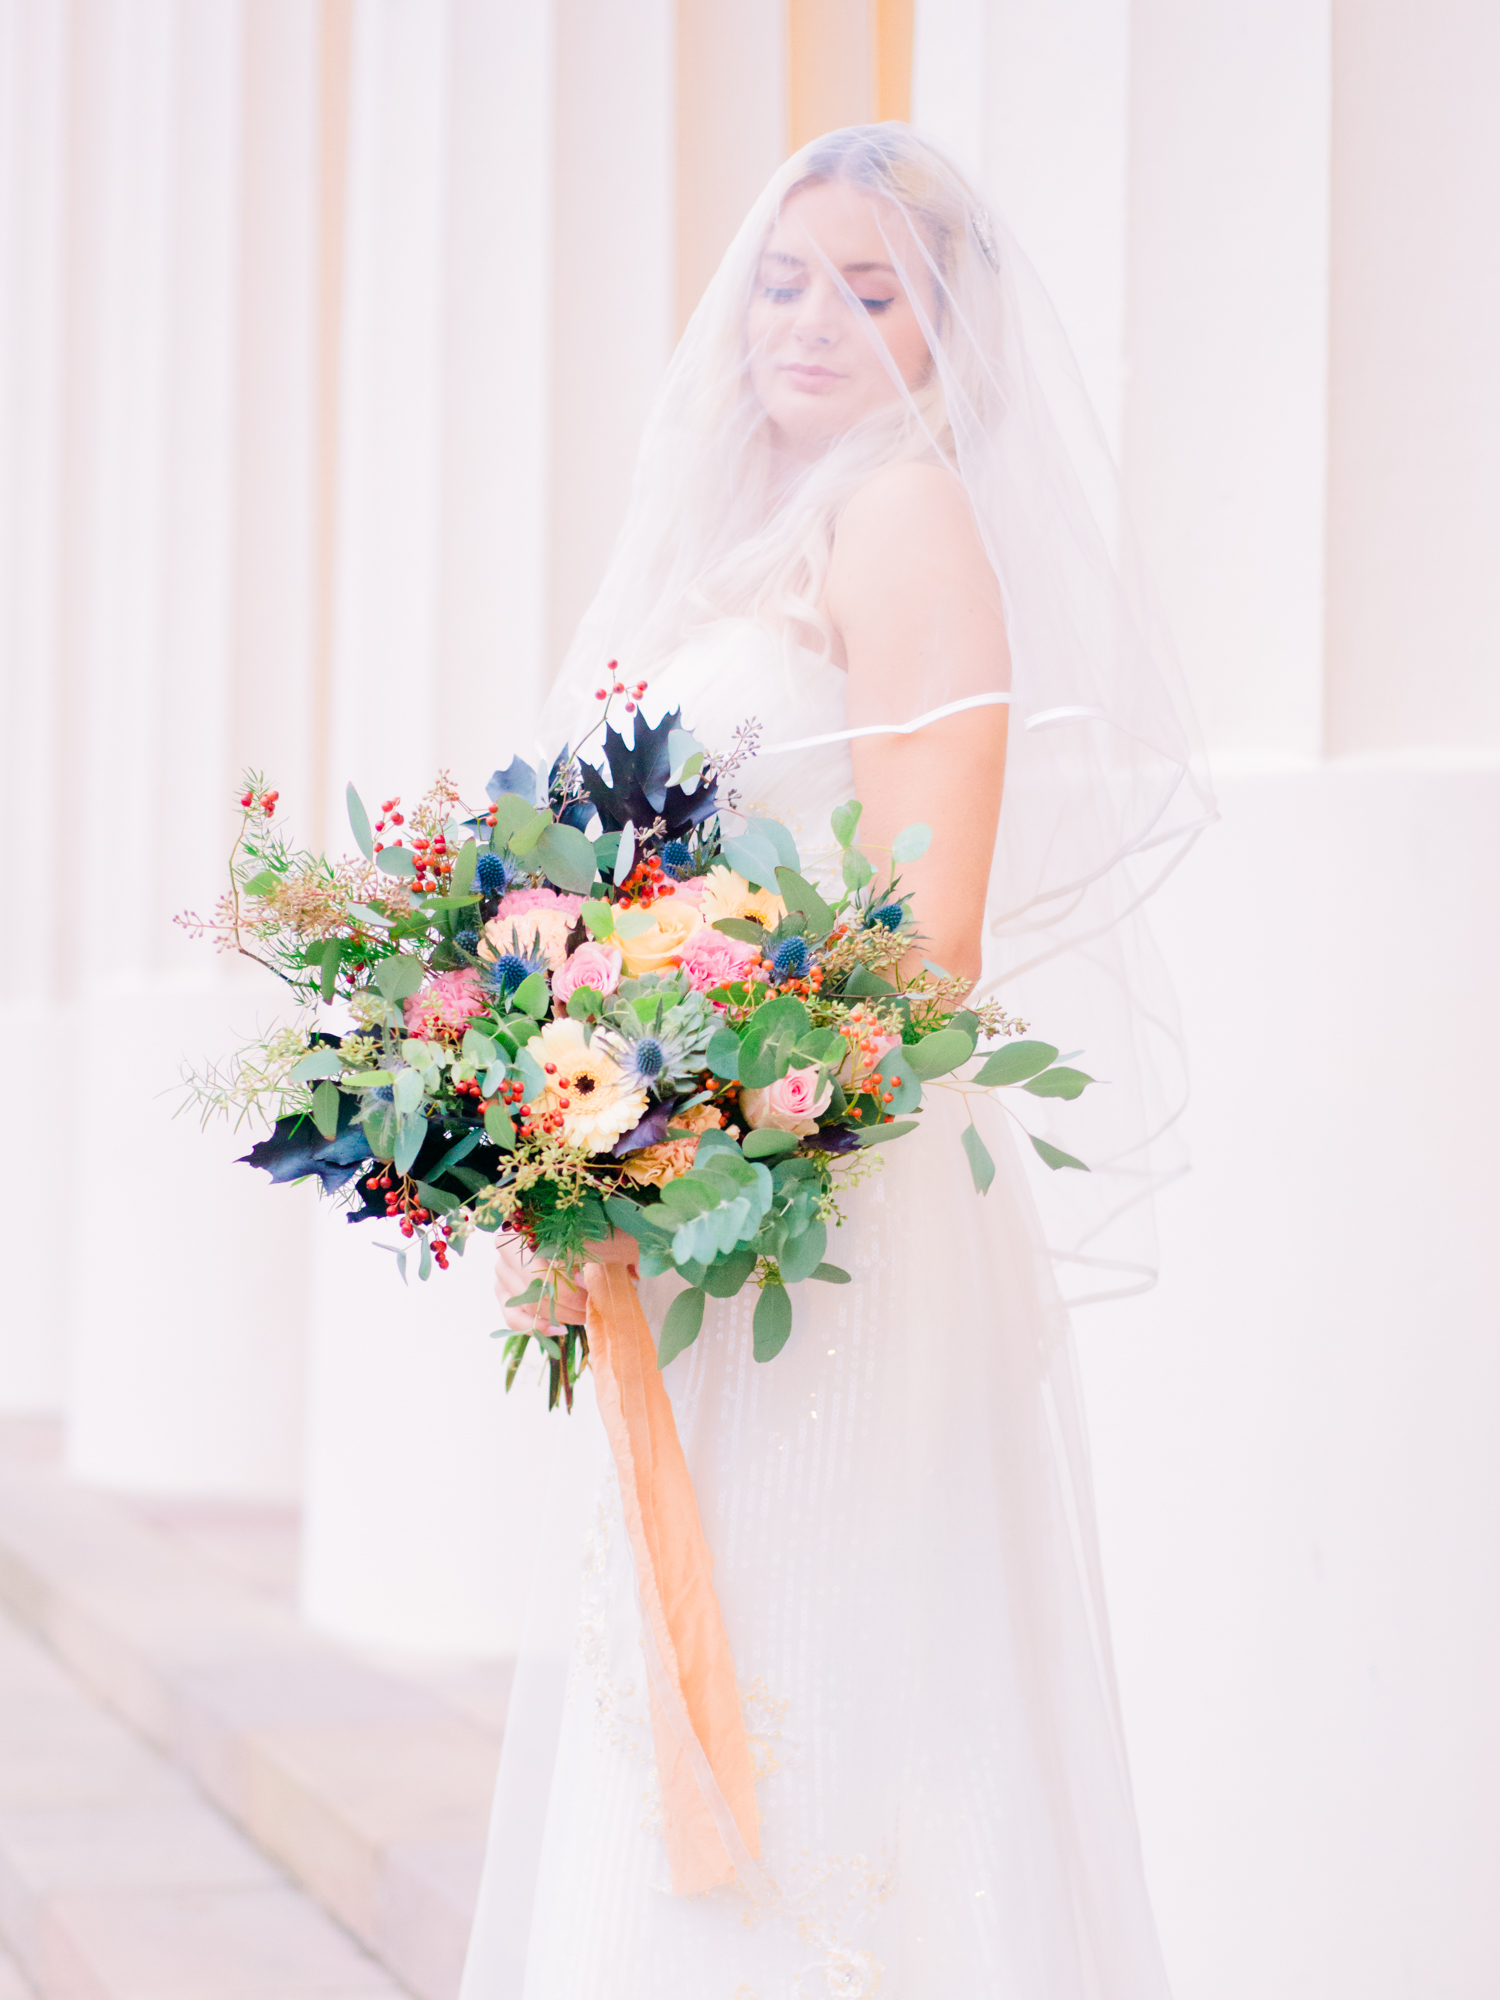 Elegant Organic Fall Swedish Bridal Wedding Styled Shoot - Erika Alvarenga Photography-68.jpg